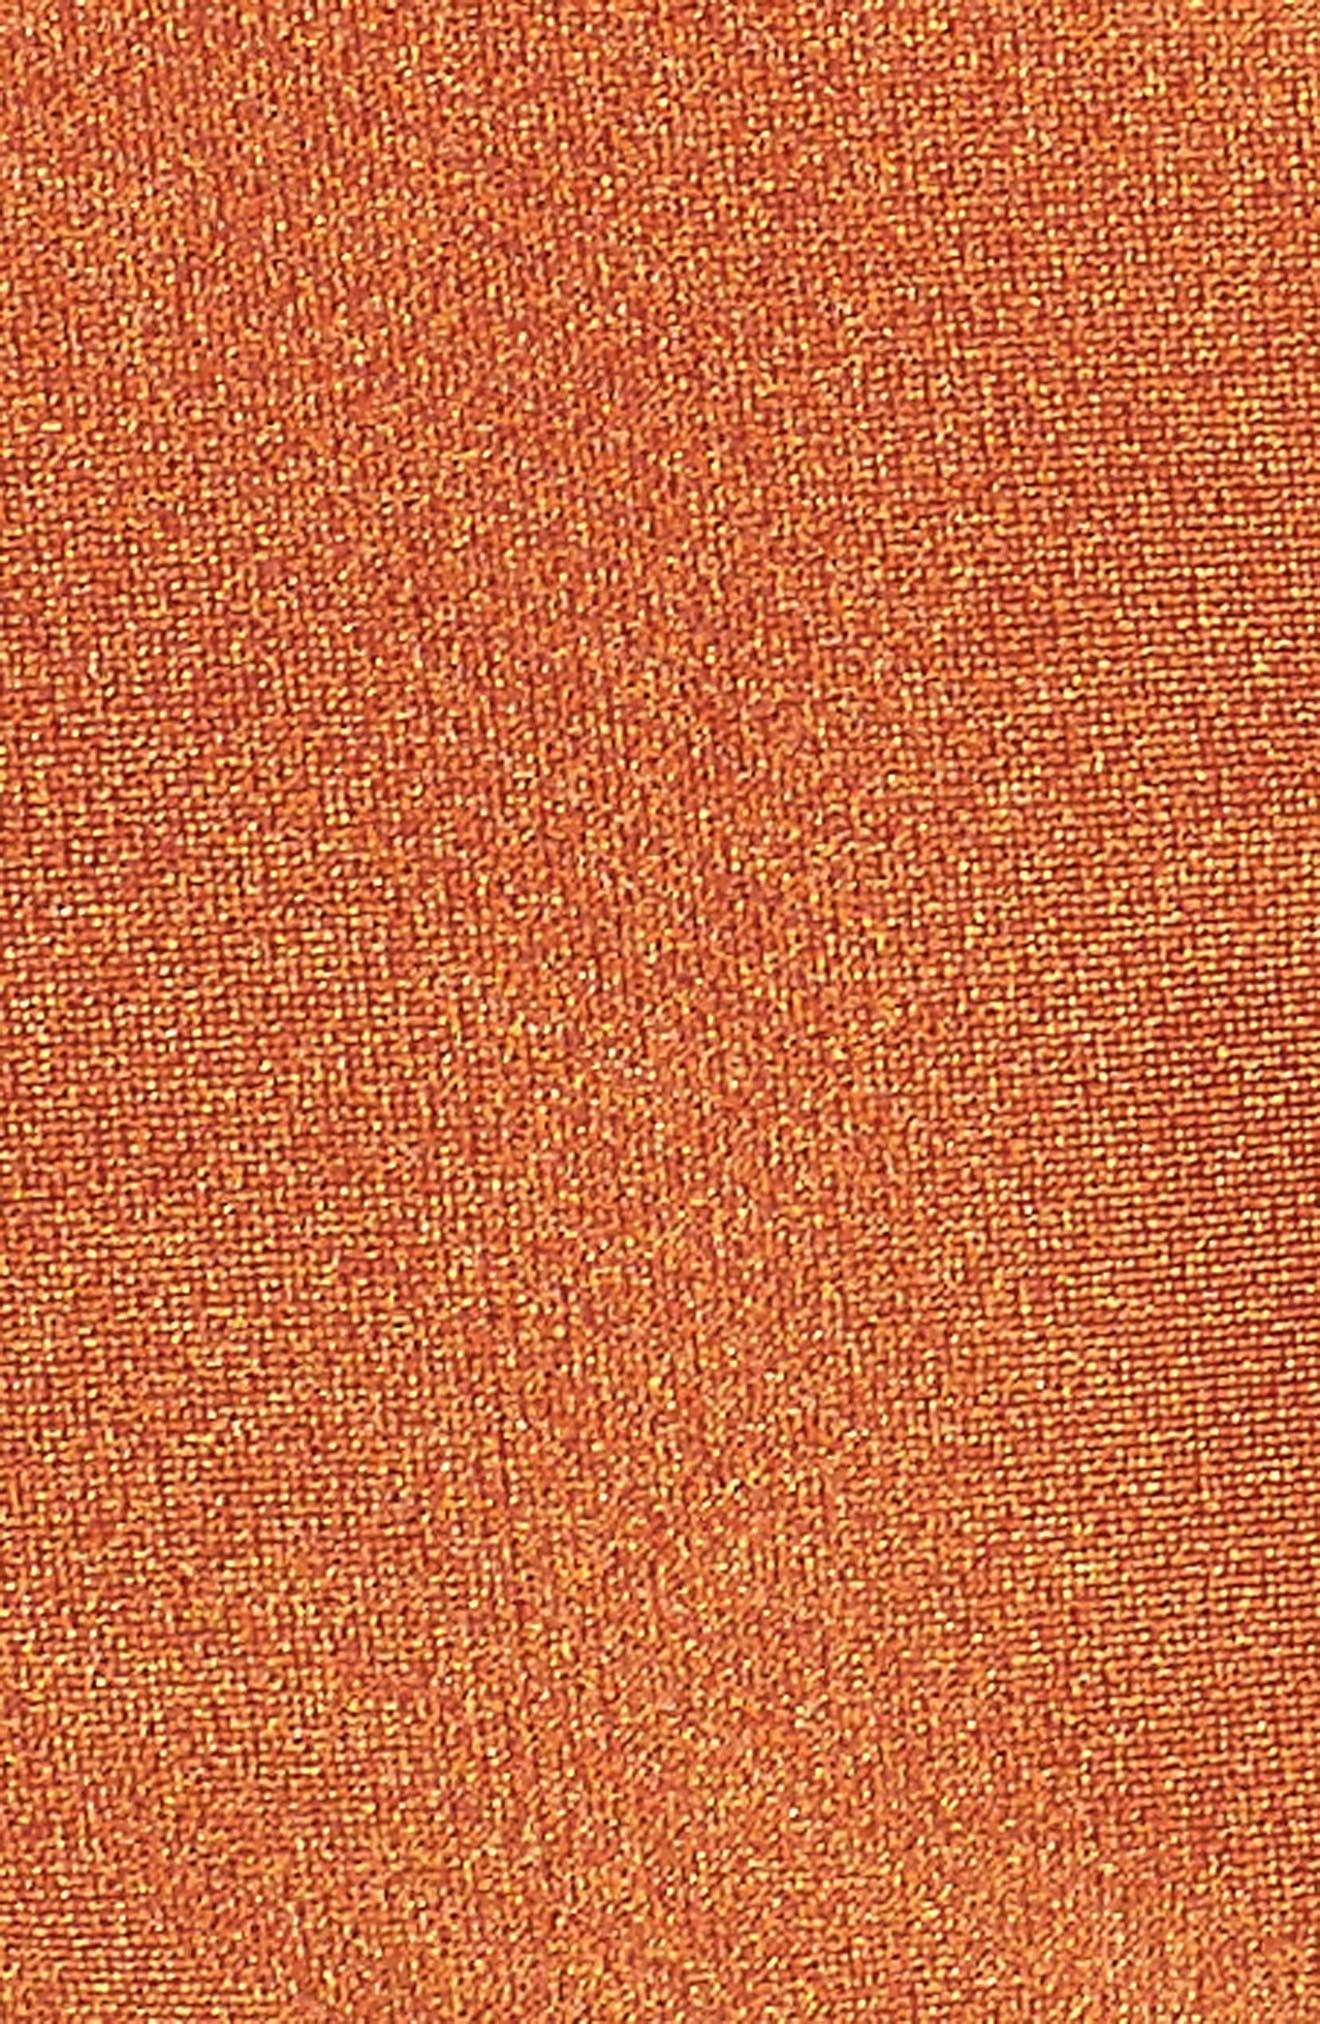 Horizon Bikini Top,                             Alternate thumbnail 8, color,                             Ginger Orange